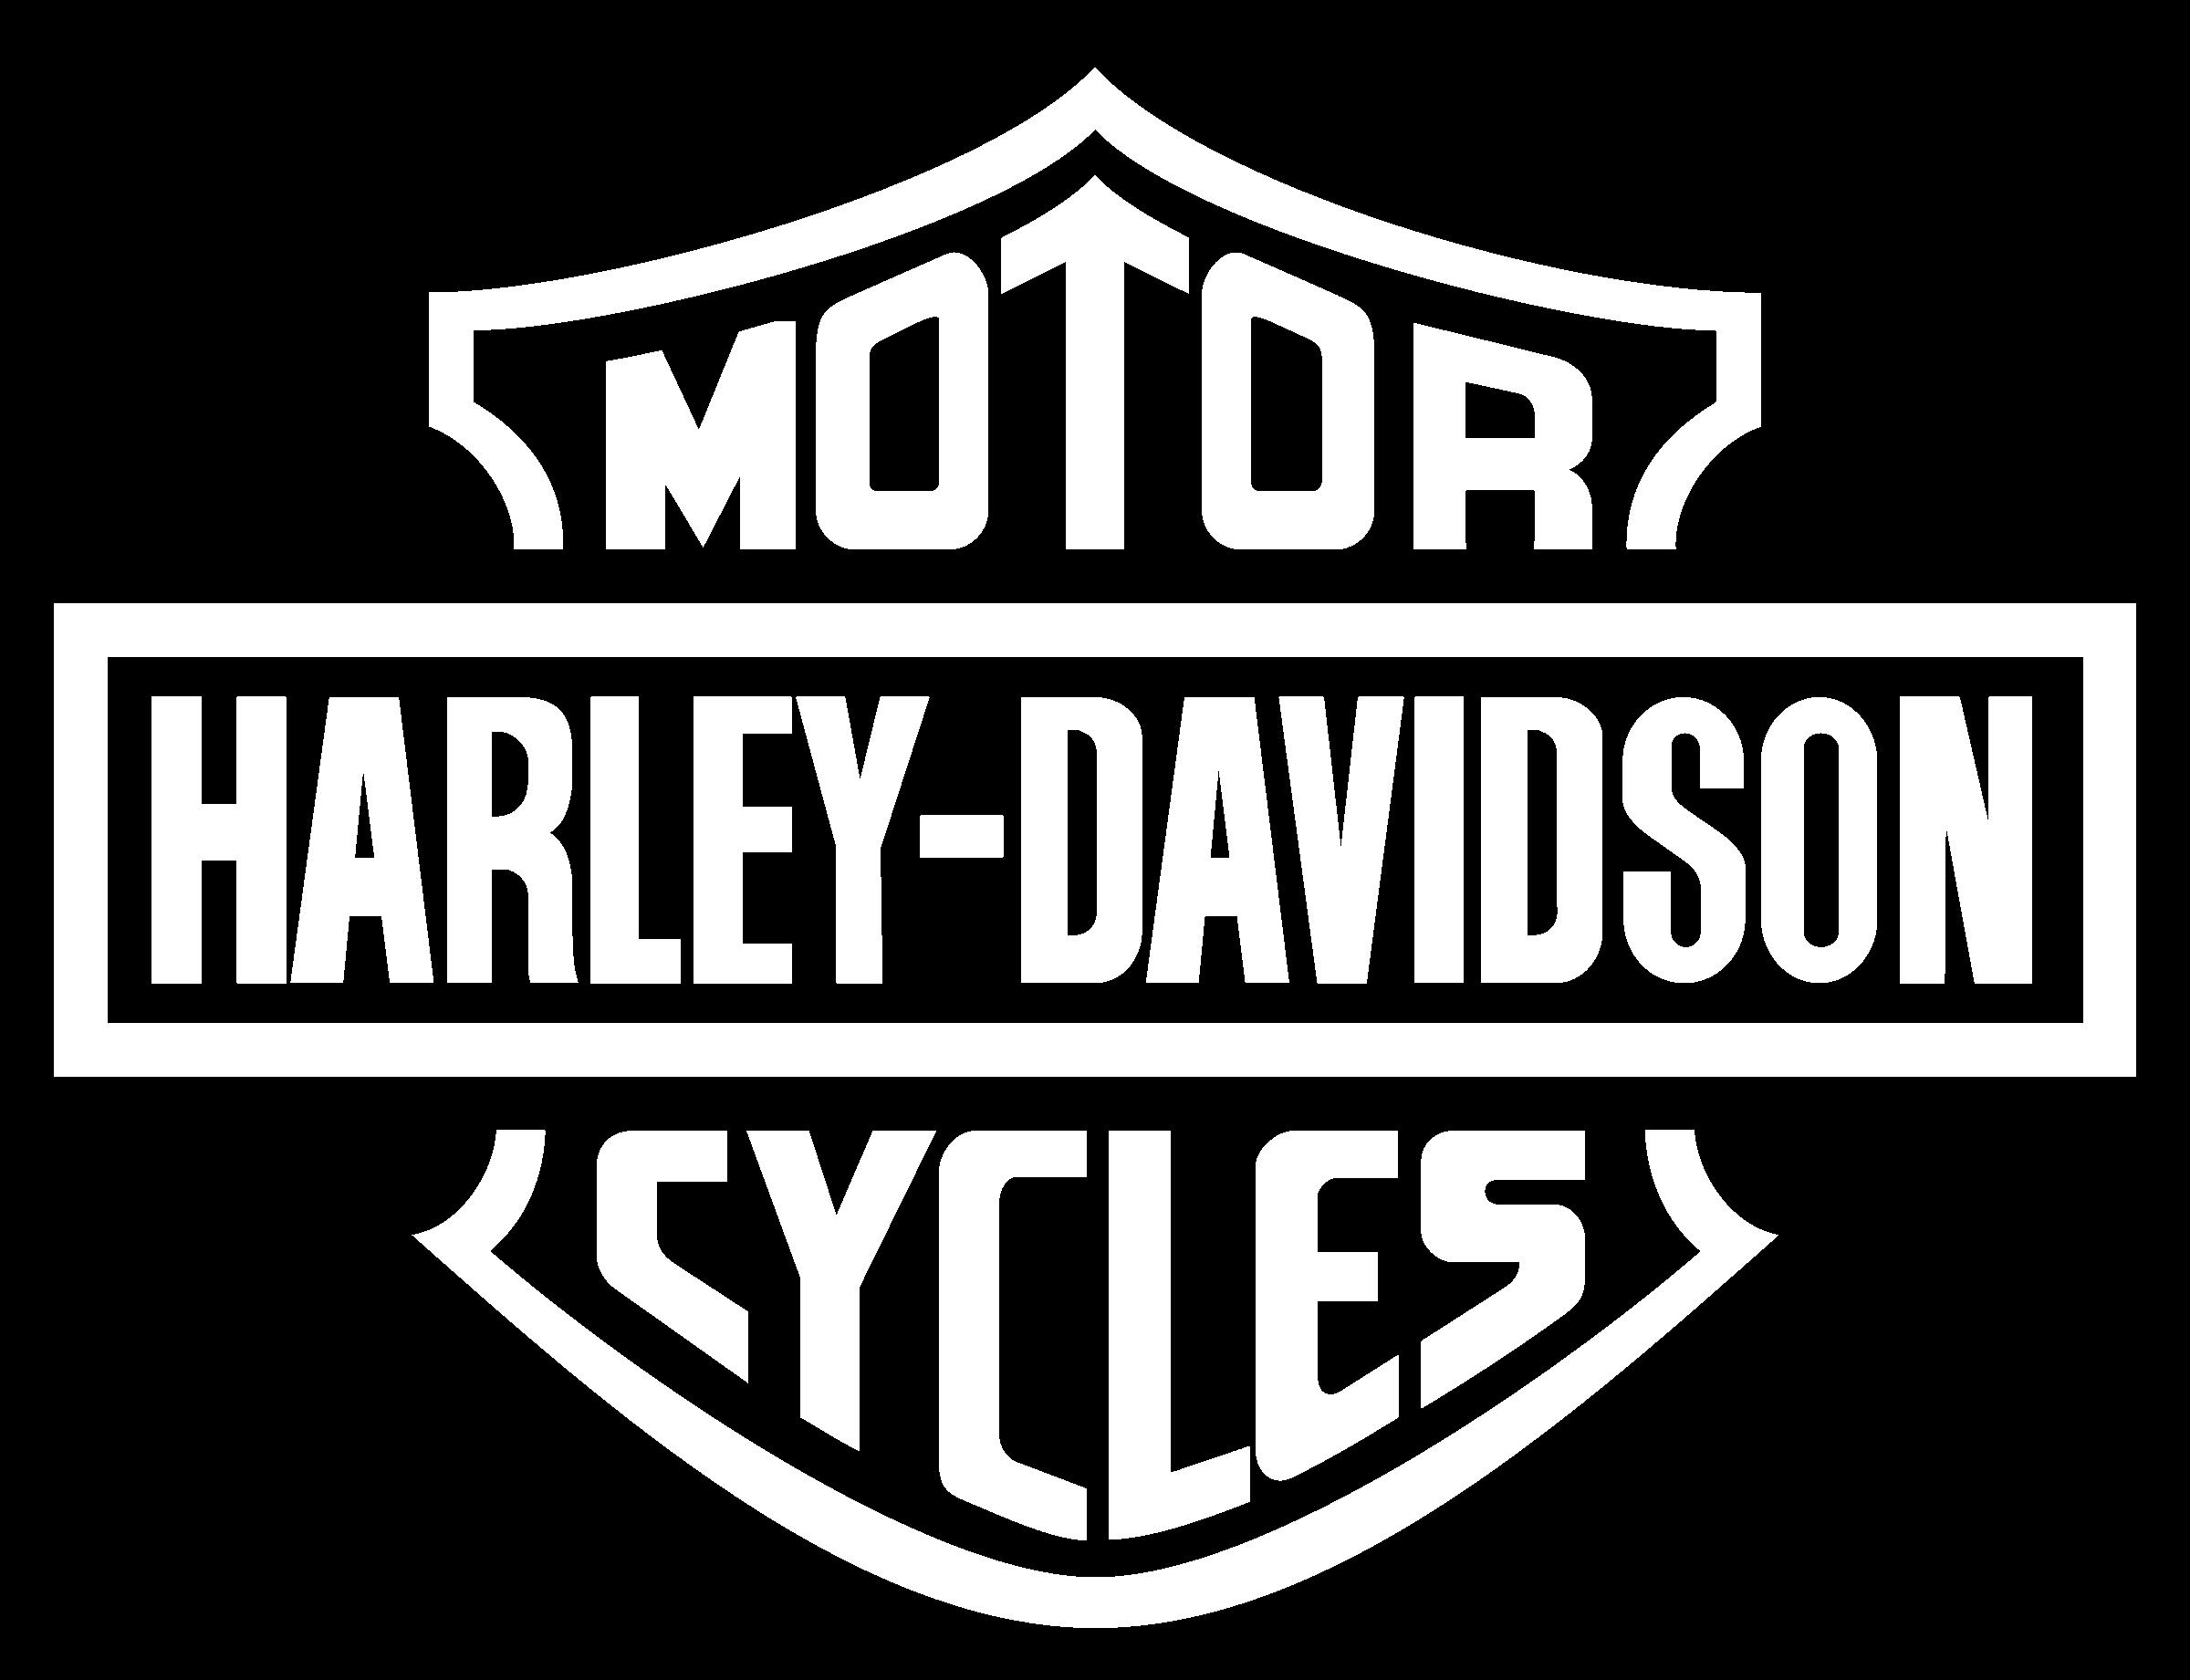 harley-davidson-11-logo-black-and-white.png